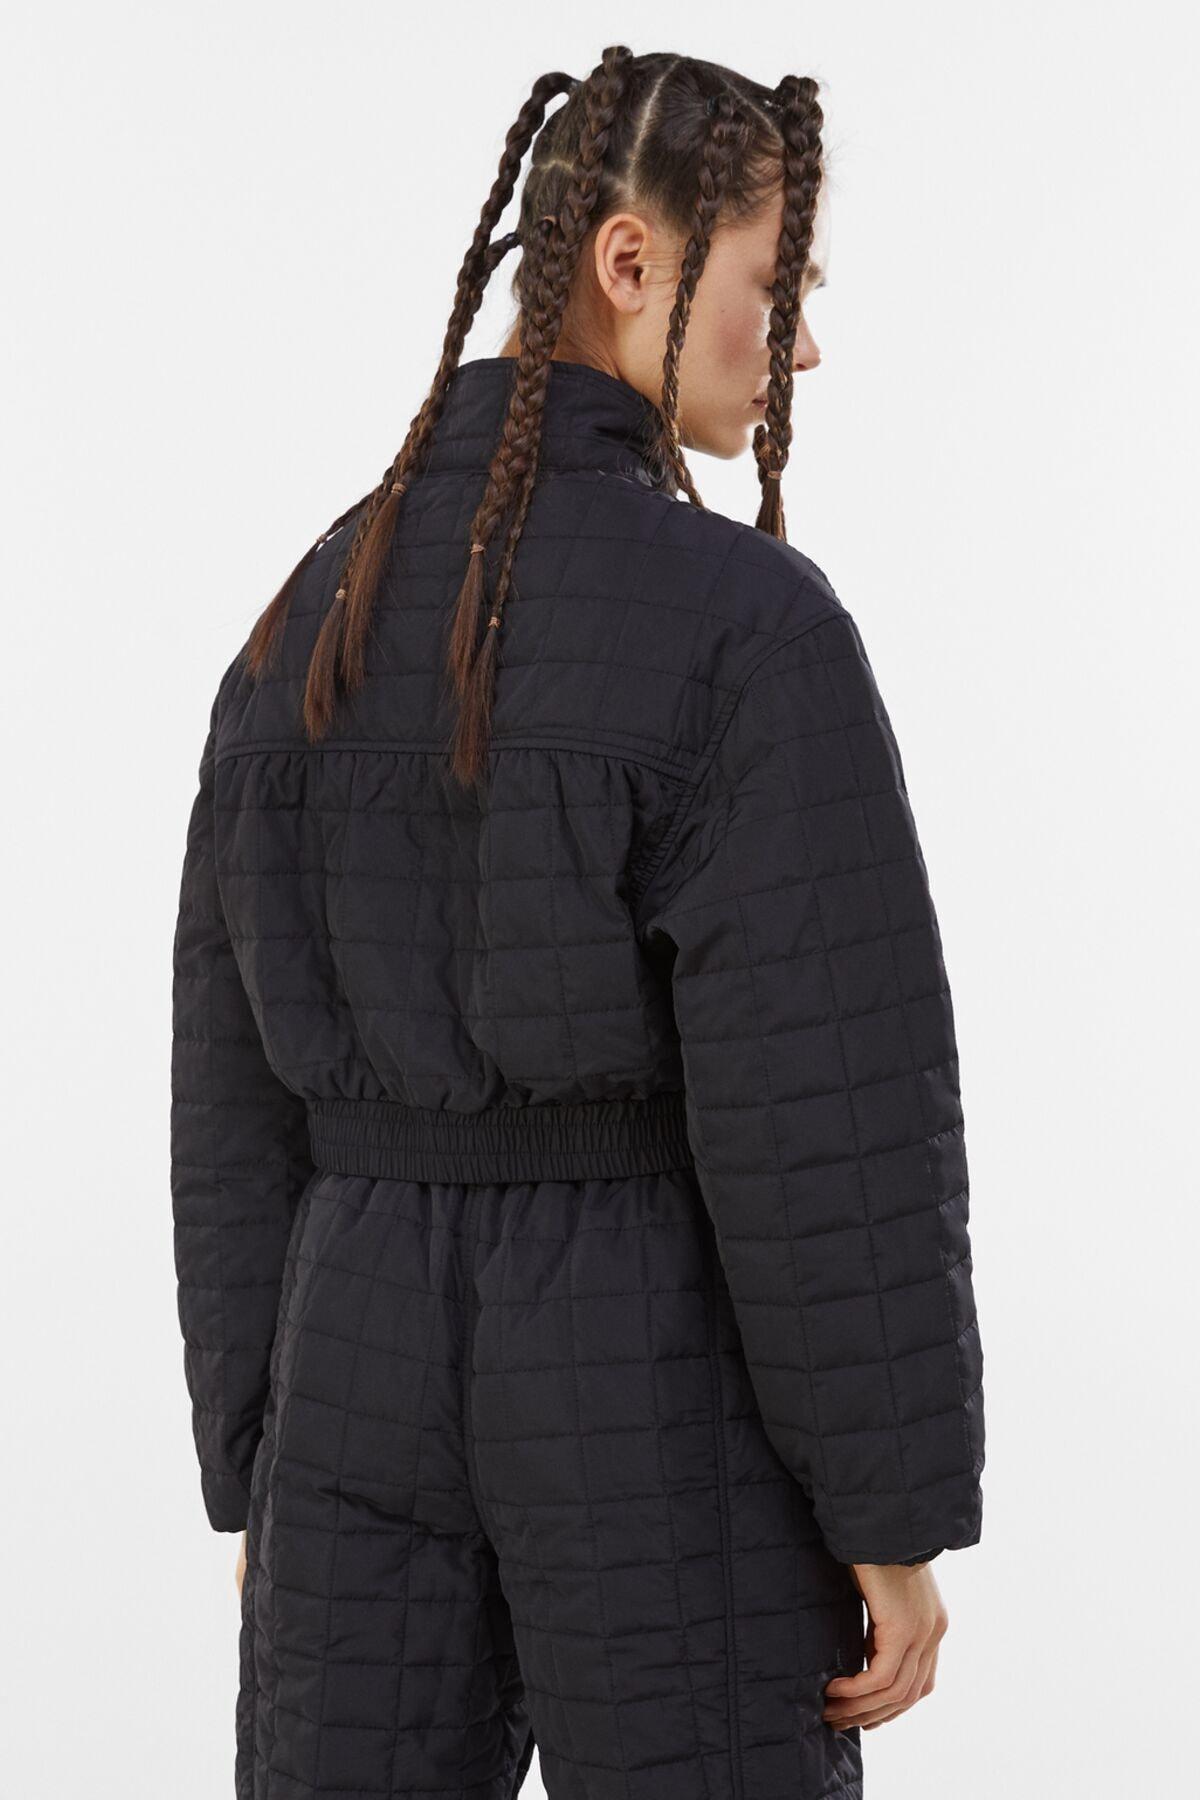 Bershka Kadın Siyah Crop Fit Kapitone Ceket 1